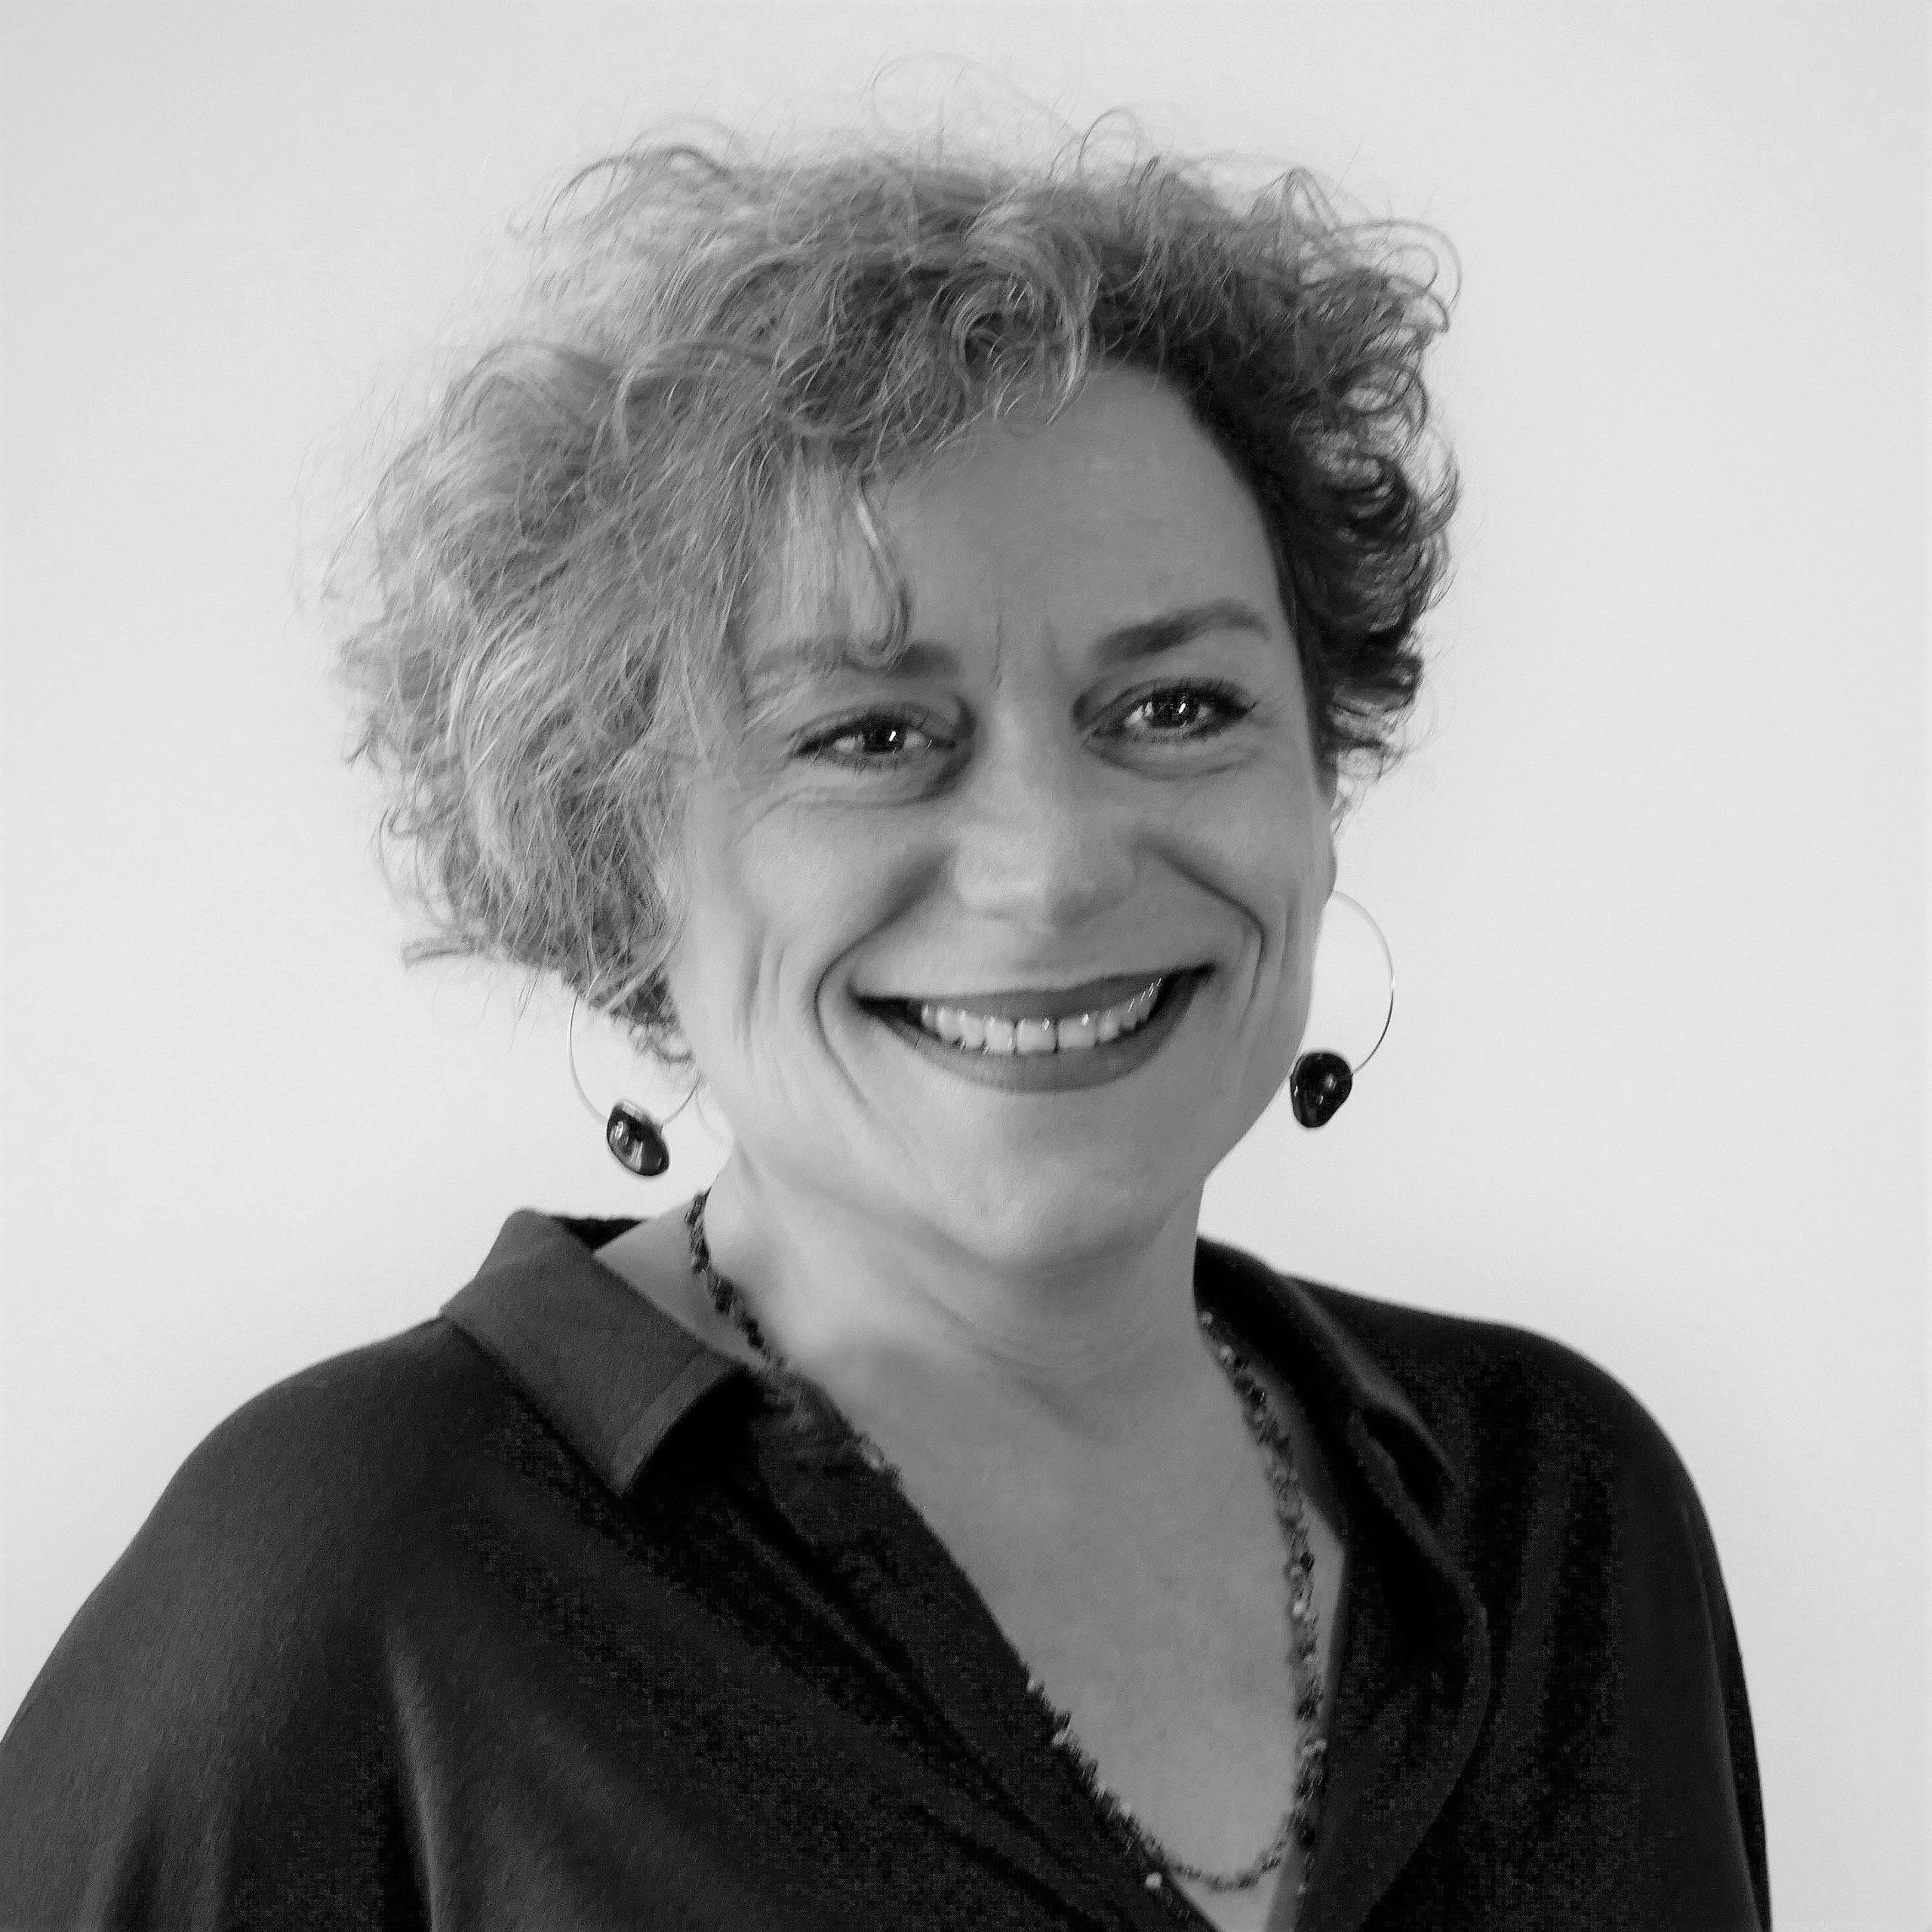 Christelle Molin-Mabille